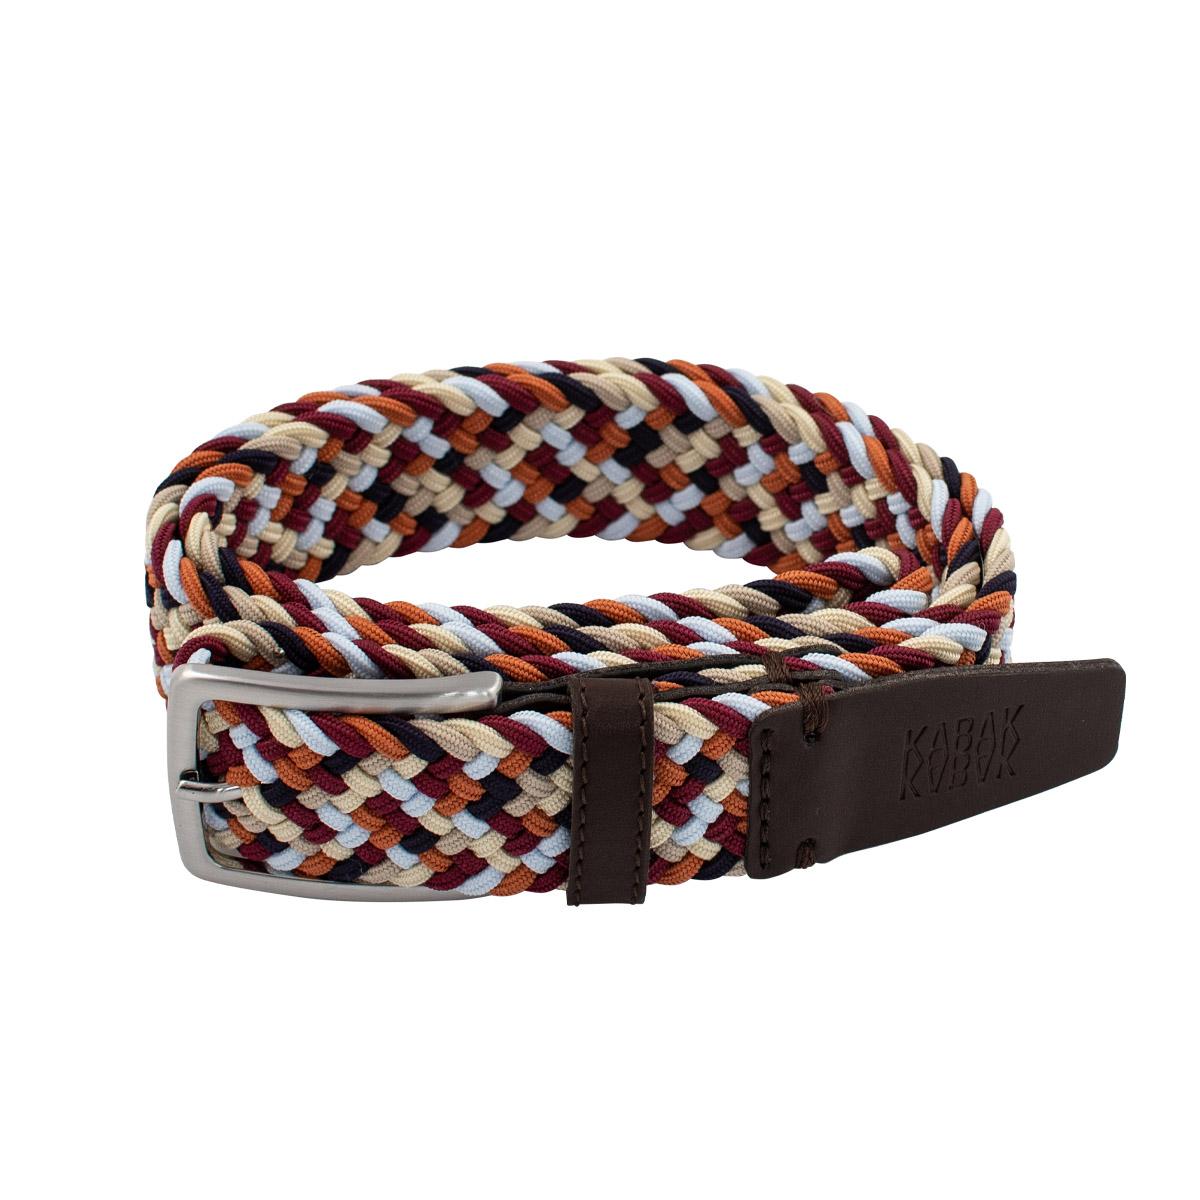 belt_woven_multicolor_C67_kabak_5903678202415